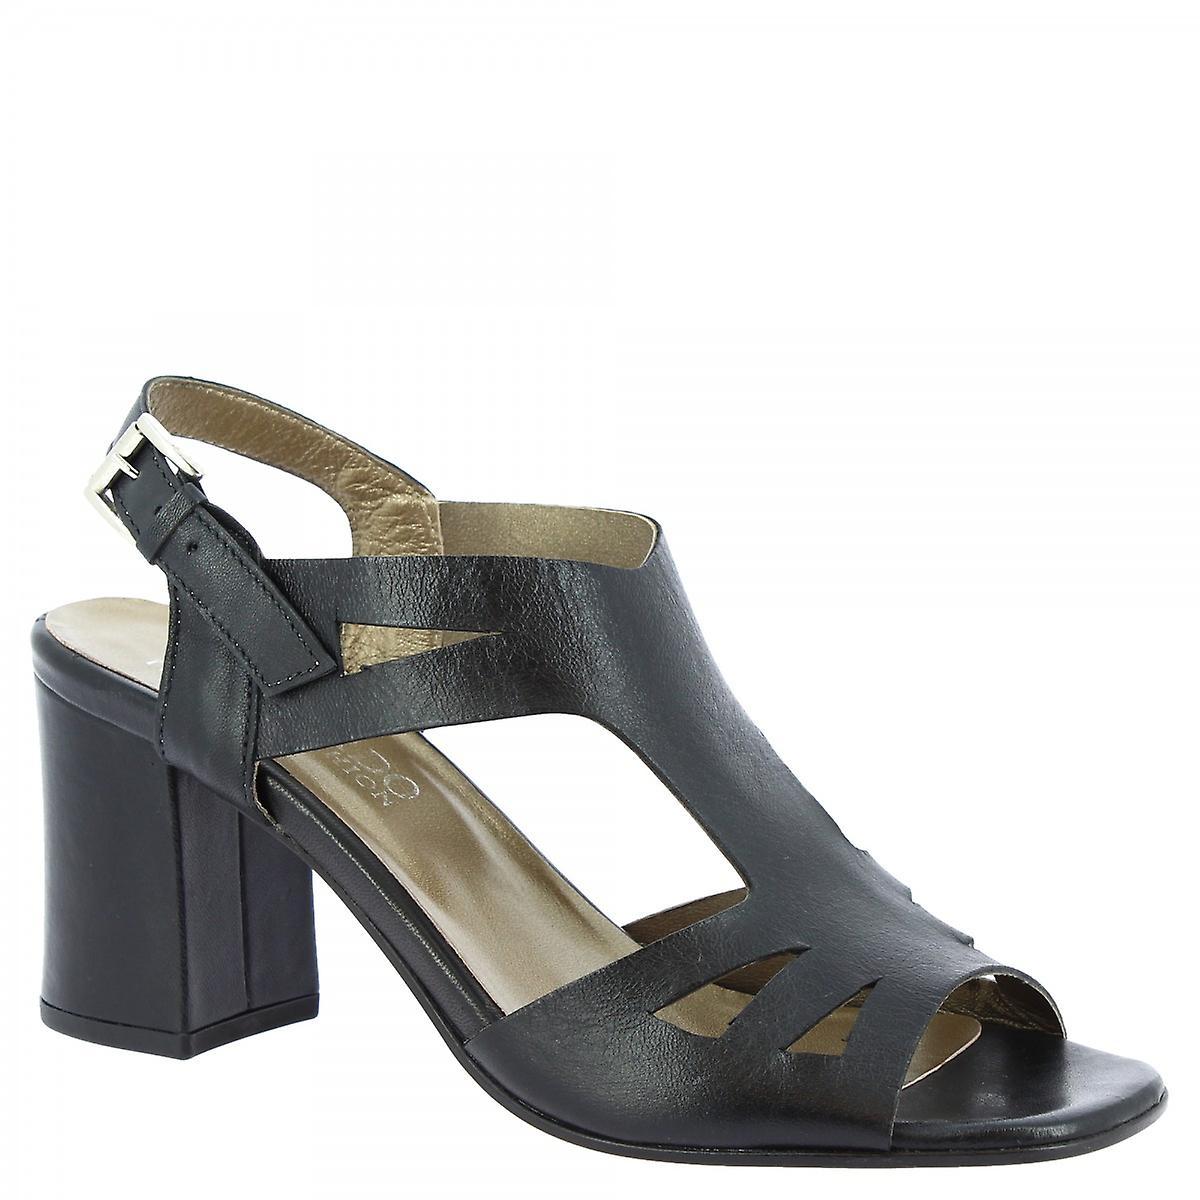 Leonardo Shoes Women's handmade heel sandals in black calf leather with buckle pRTRM